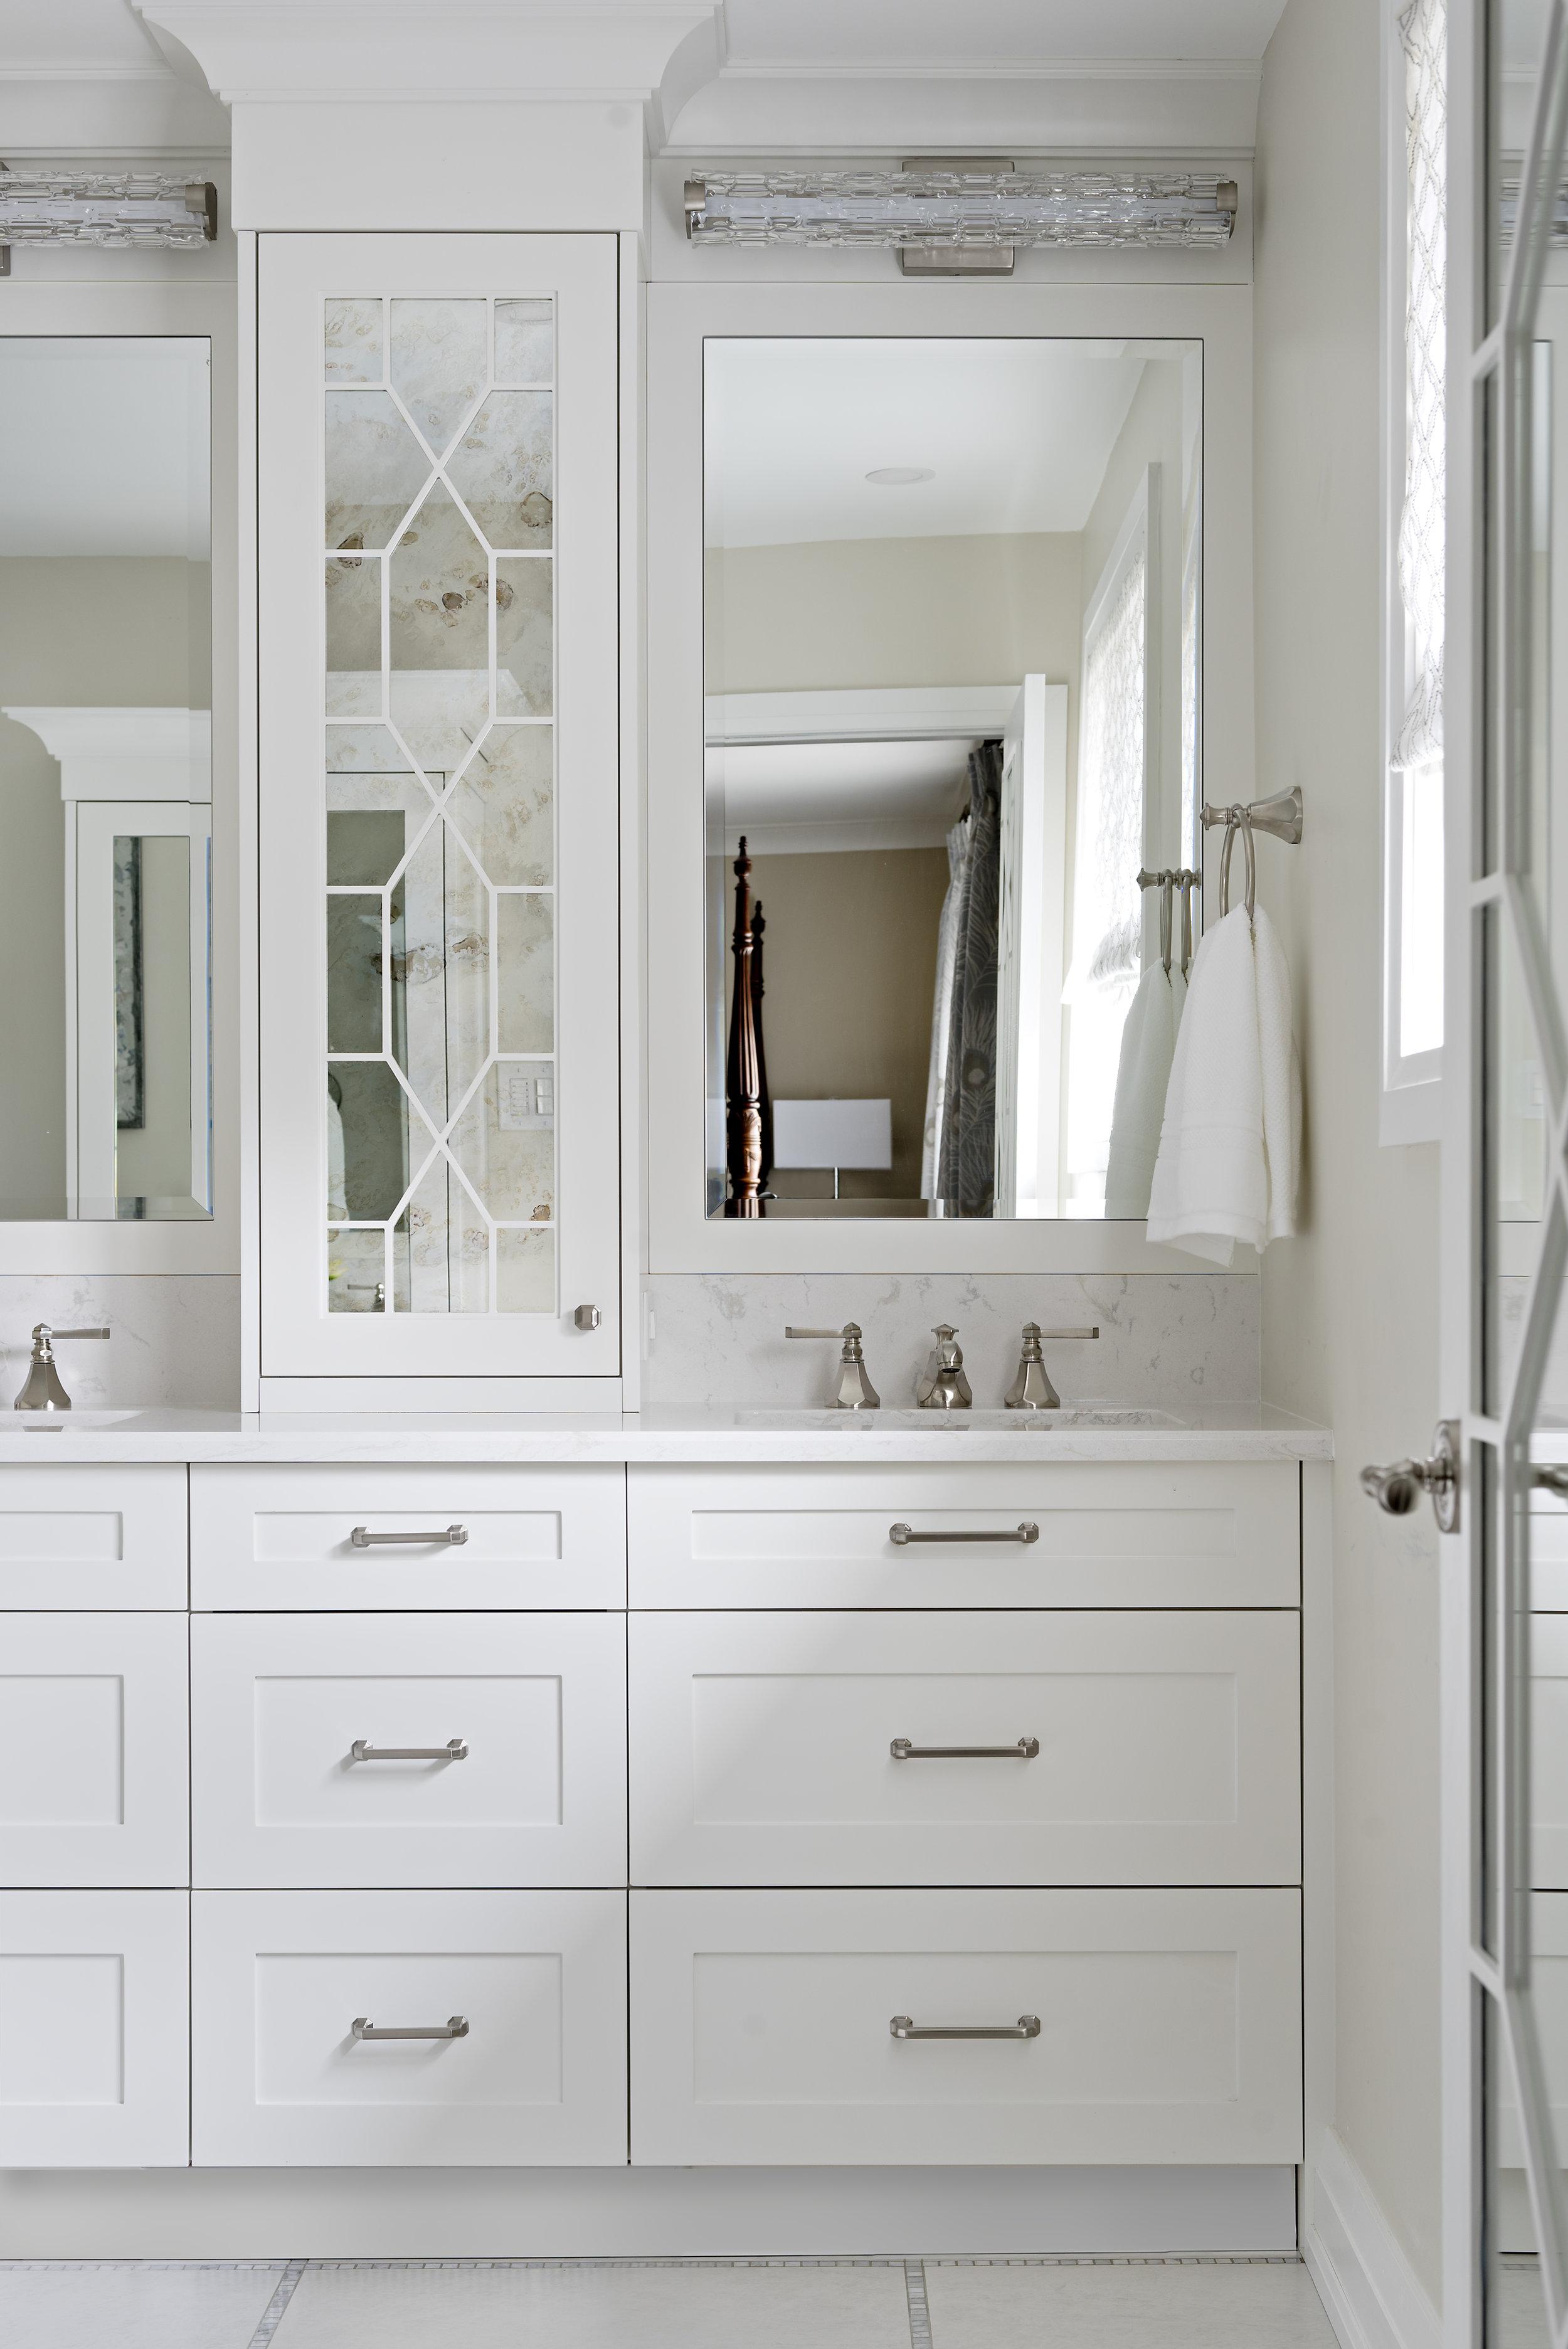 pizzale design interior design white bathroom shaker vanity white quartz countertop antique mirror cabinet door accent moulding satin nickel widespread faucet marble inlay floor tile.jpg